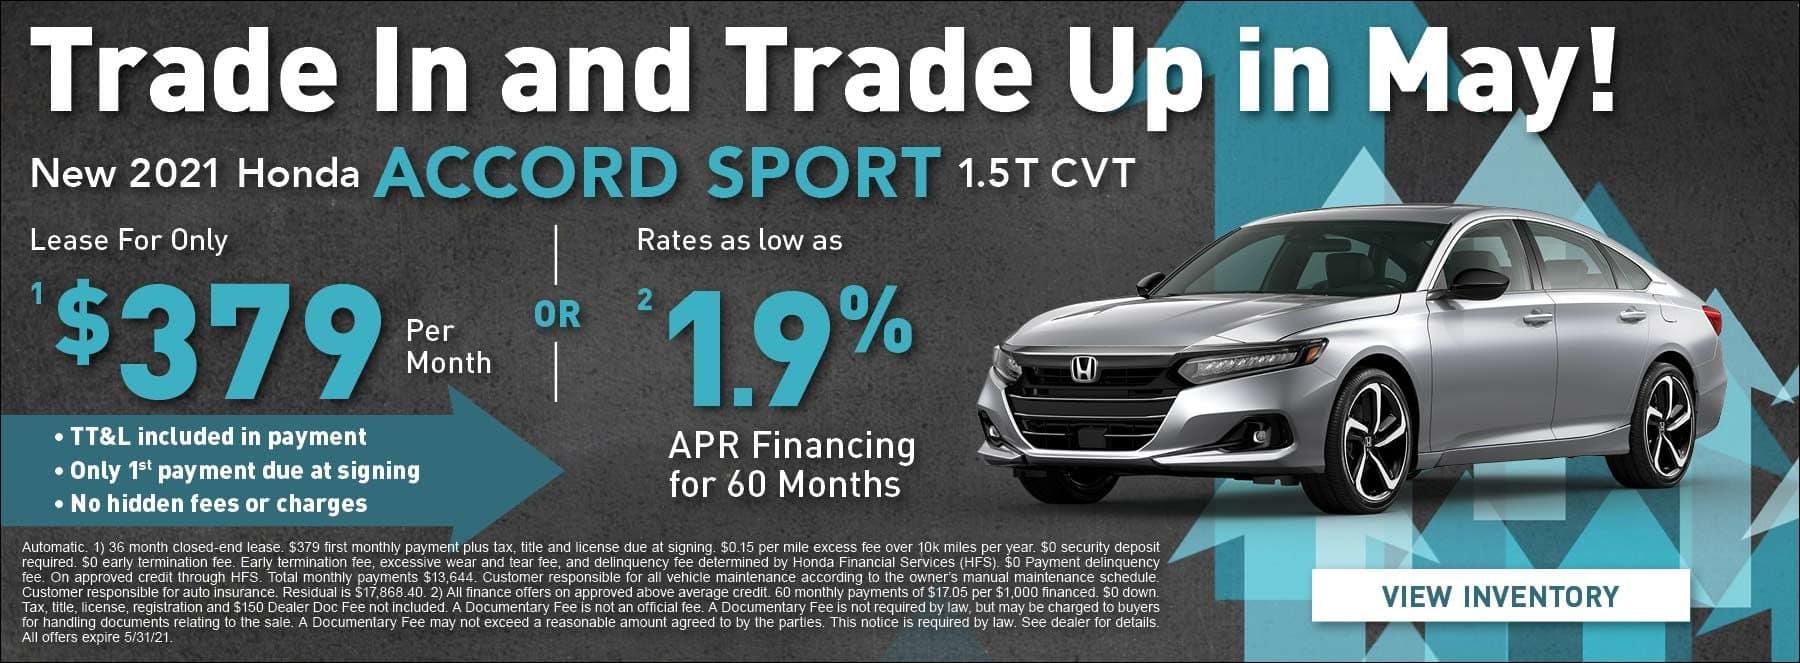 New 2021 Honda Accord Sport 1.5 CVT